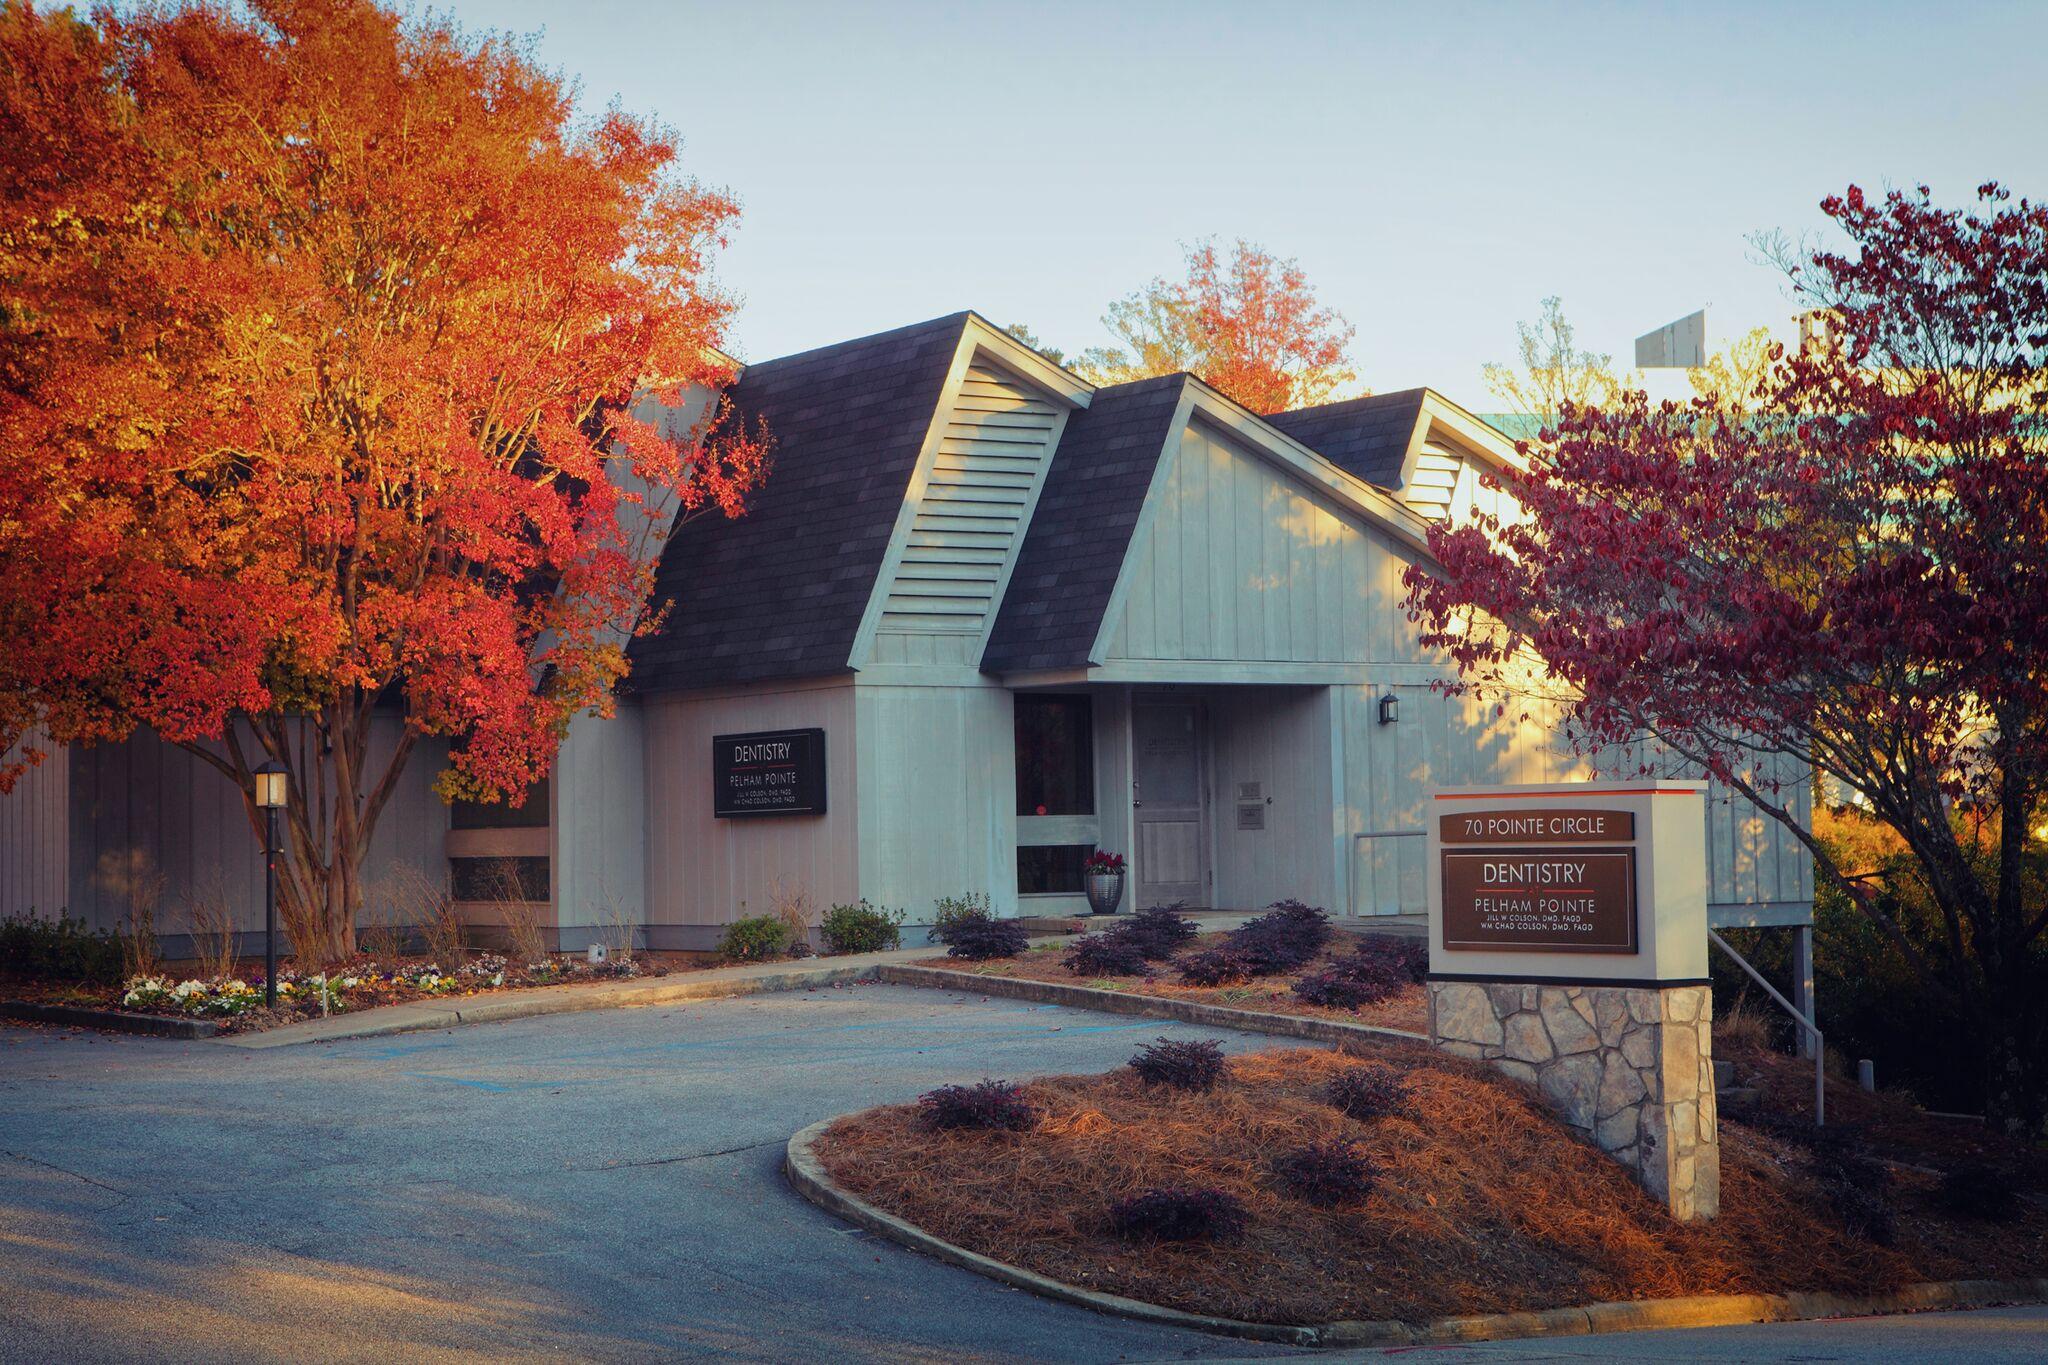 Dentistry at Pelham Pointe Reviews, Ratings | Dentists near 70 Pointe Cir , Greenville SC